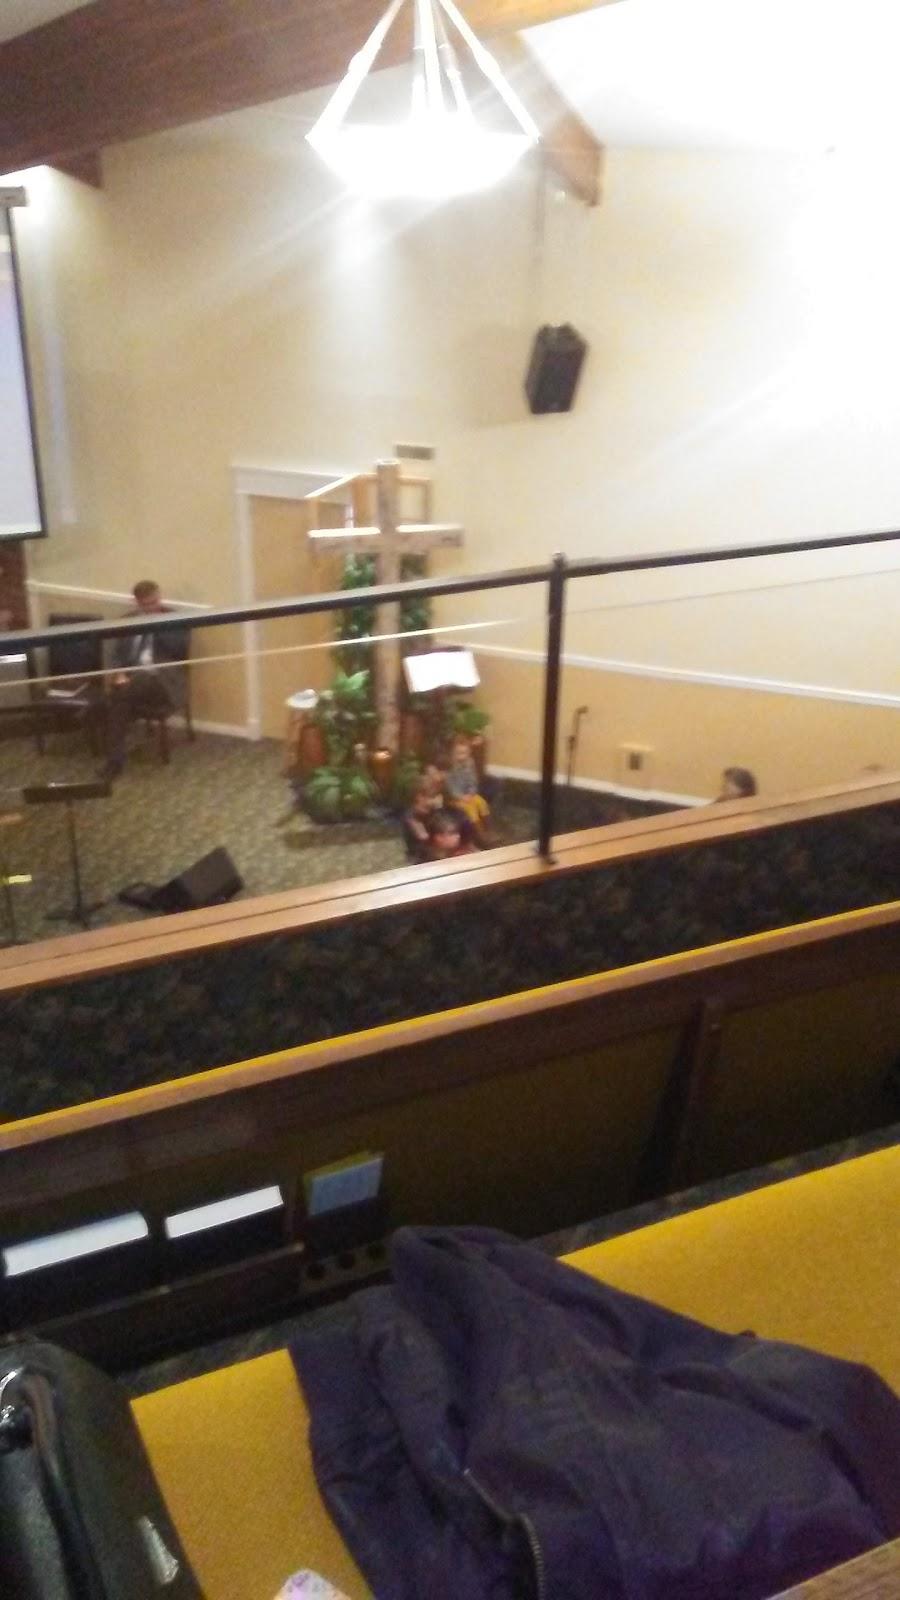 The Penticton Church of the Nazarene | church | 523 Jermyn Ave, Penticton, BC V2A 2E2, Canada | 2504924028 OR +1 250-492-4028